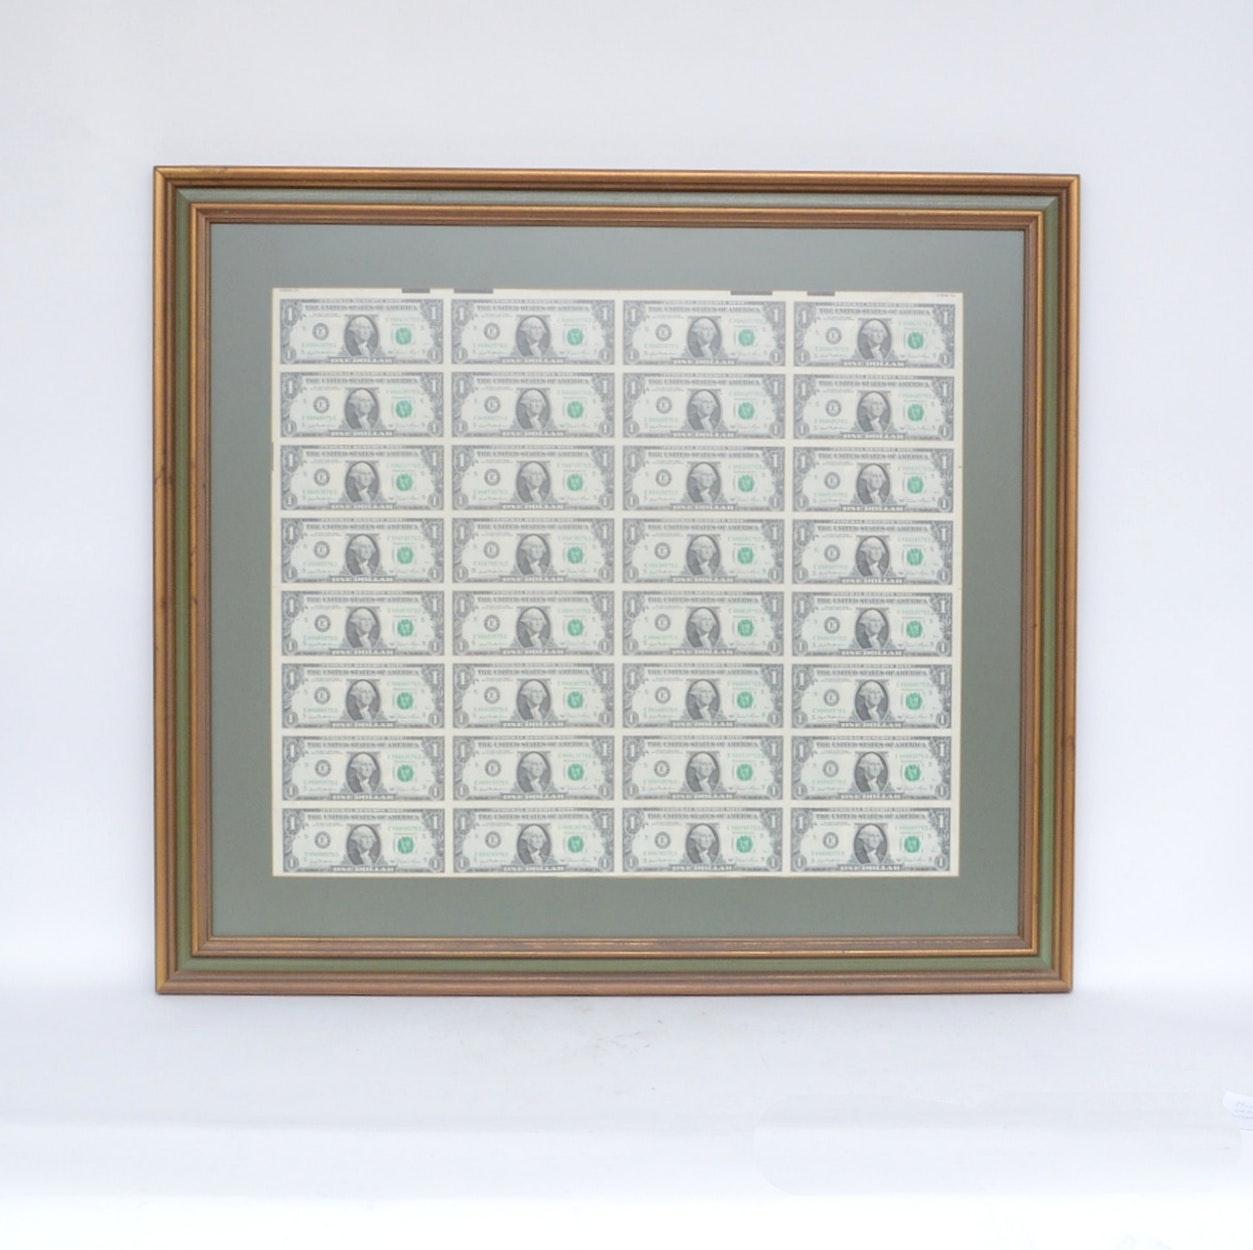 Framed Uncut Sheet of Series 1981 $1 Federal Reserve Notes